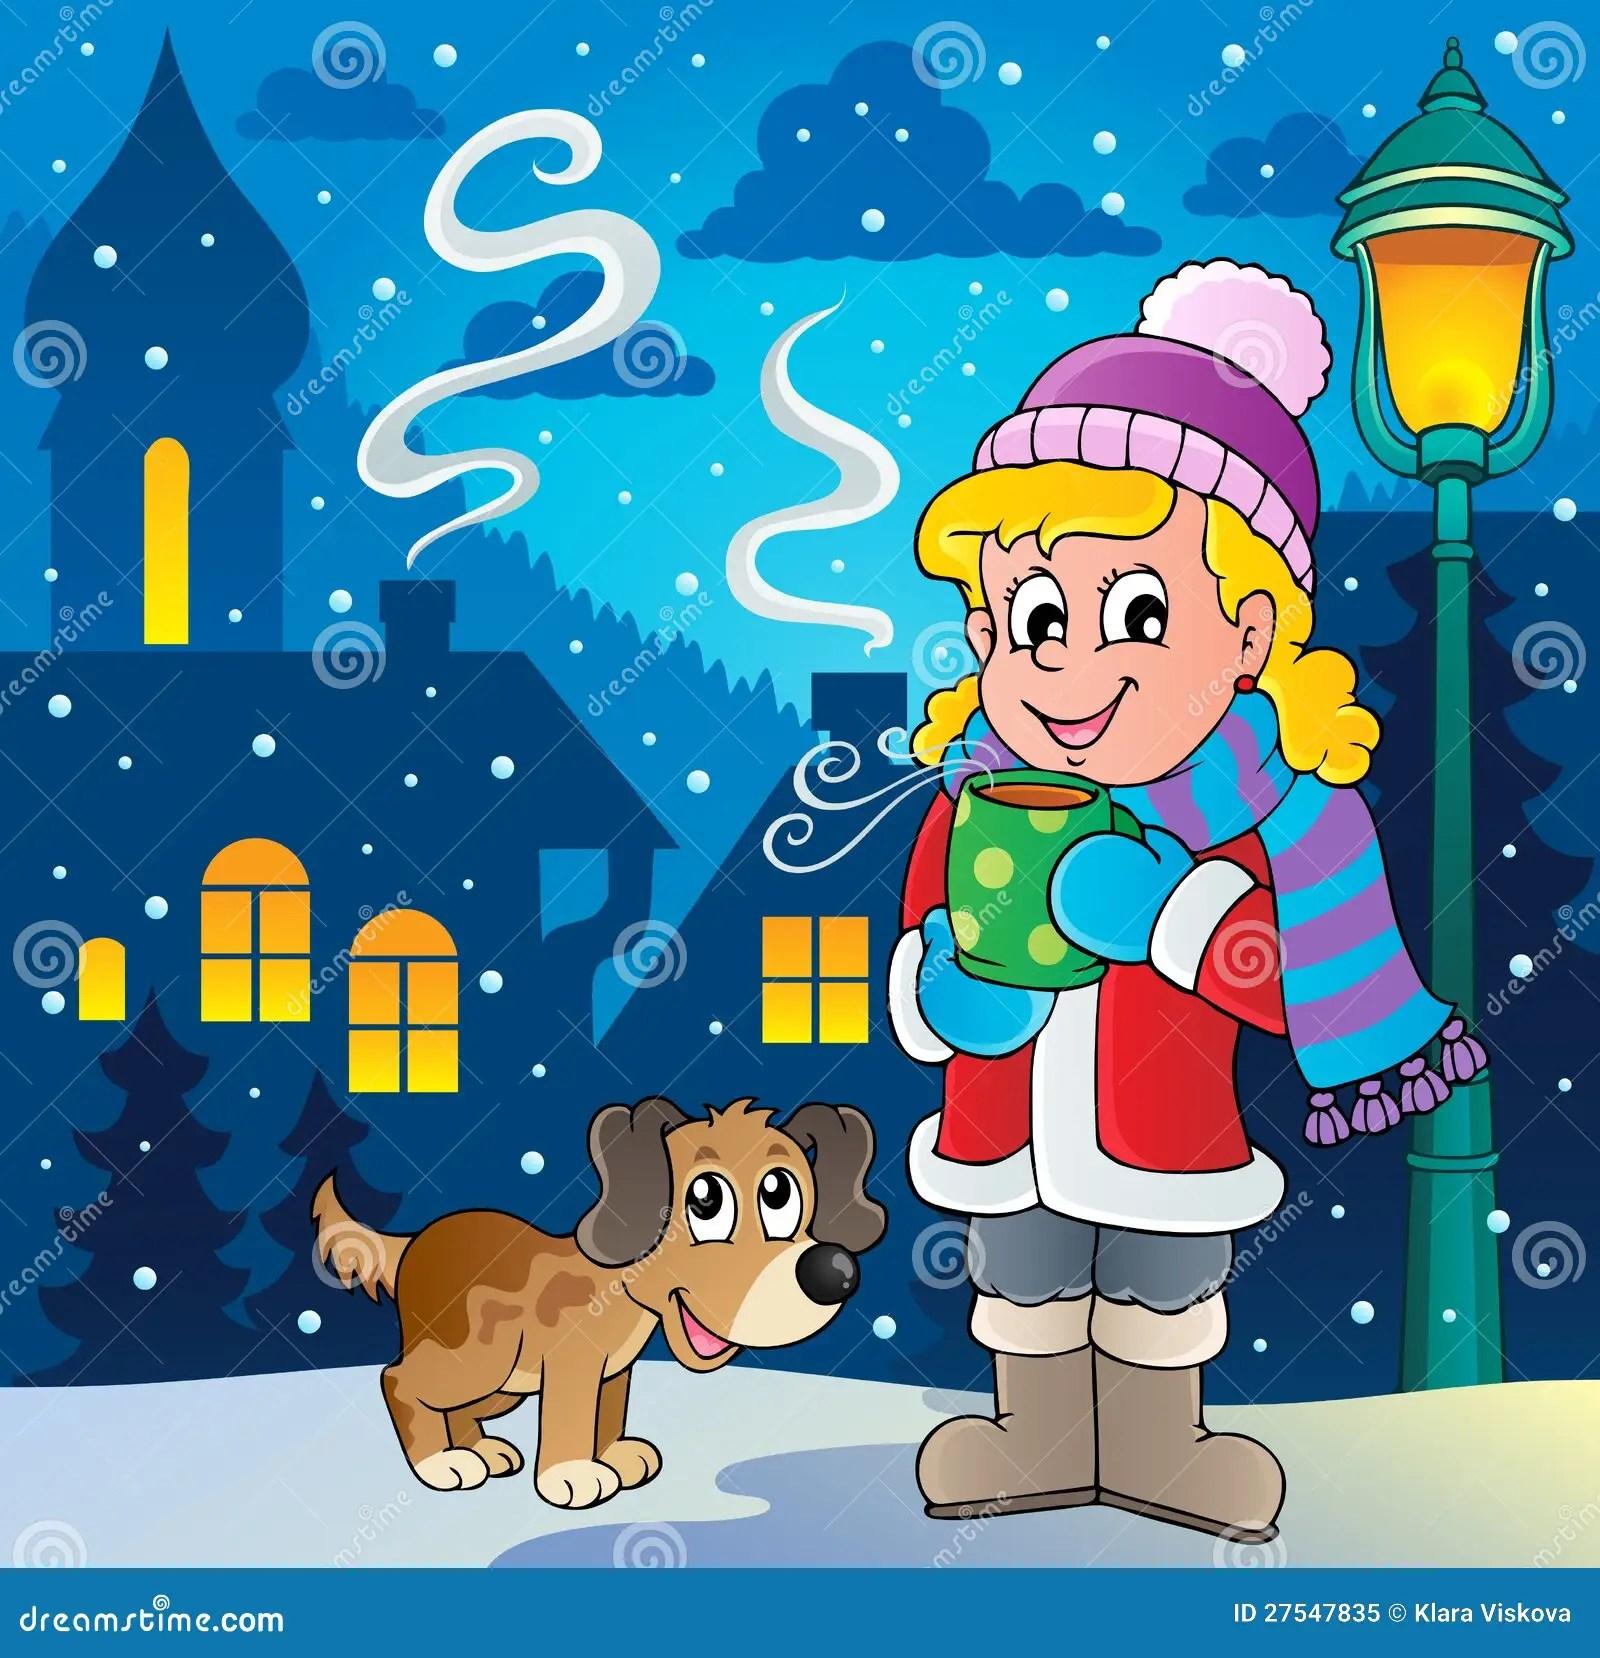 Winter Person Cartoon Image 2 Stock Vector Image 27547835